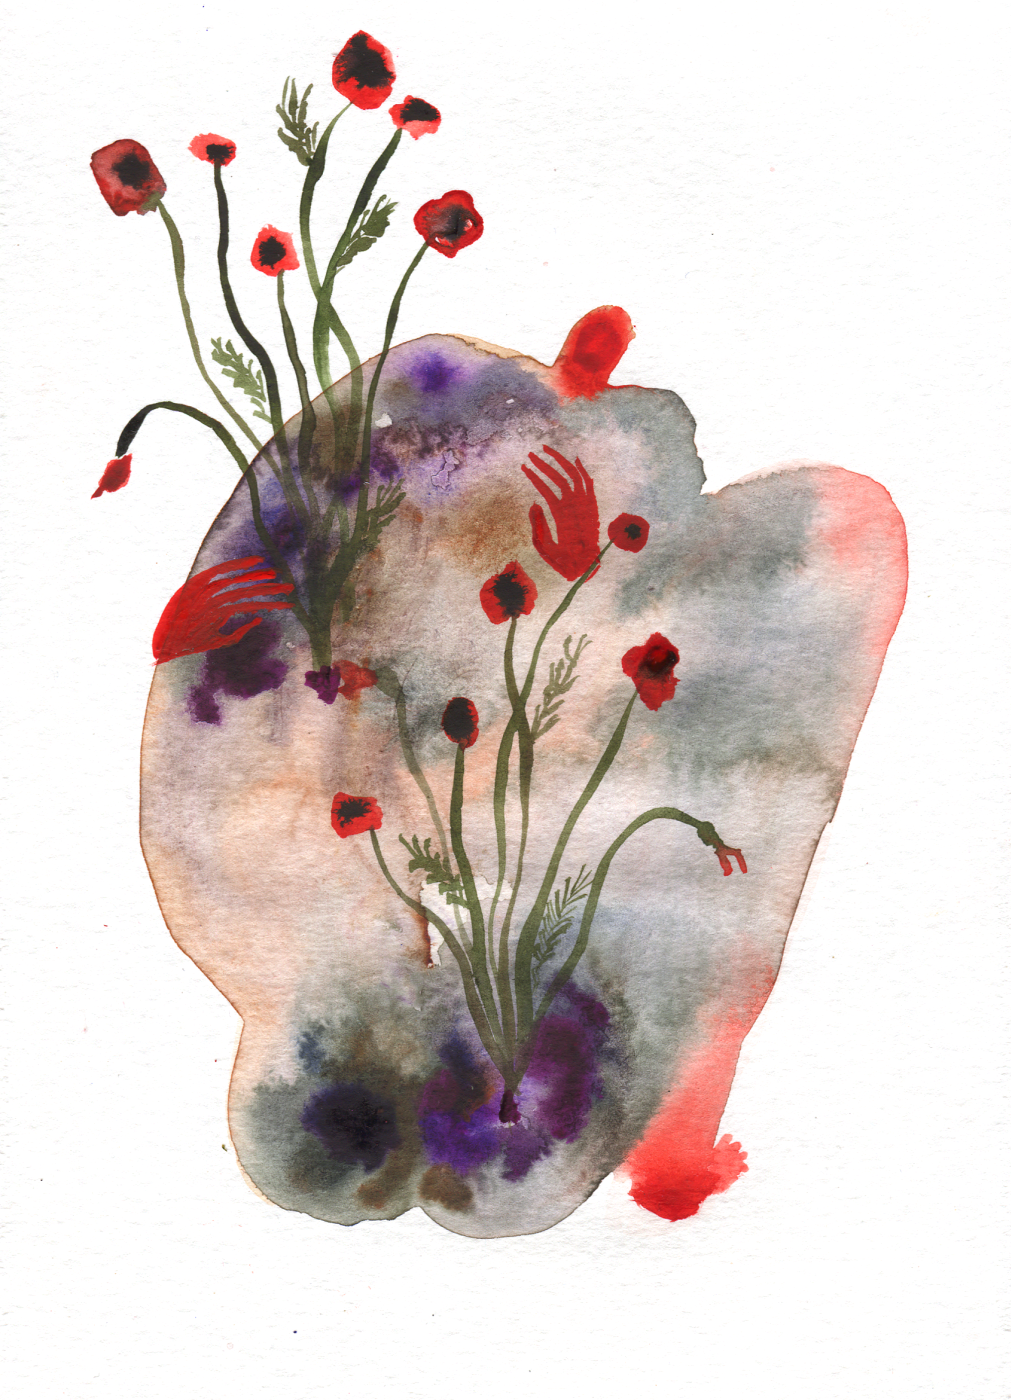 Anastasia Sergeevna Rydlevskaya. Flowers of pain. What are you, nobody beat anyone